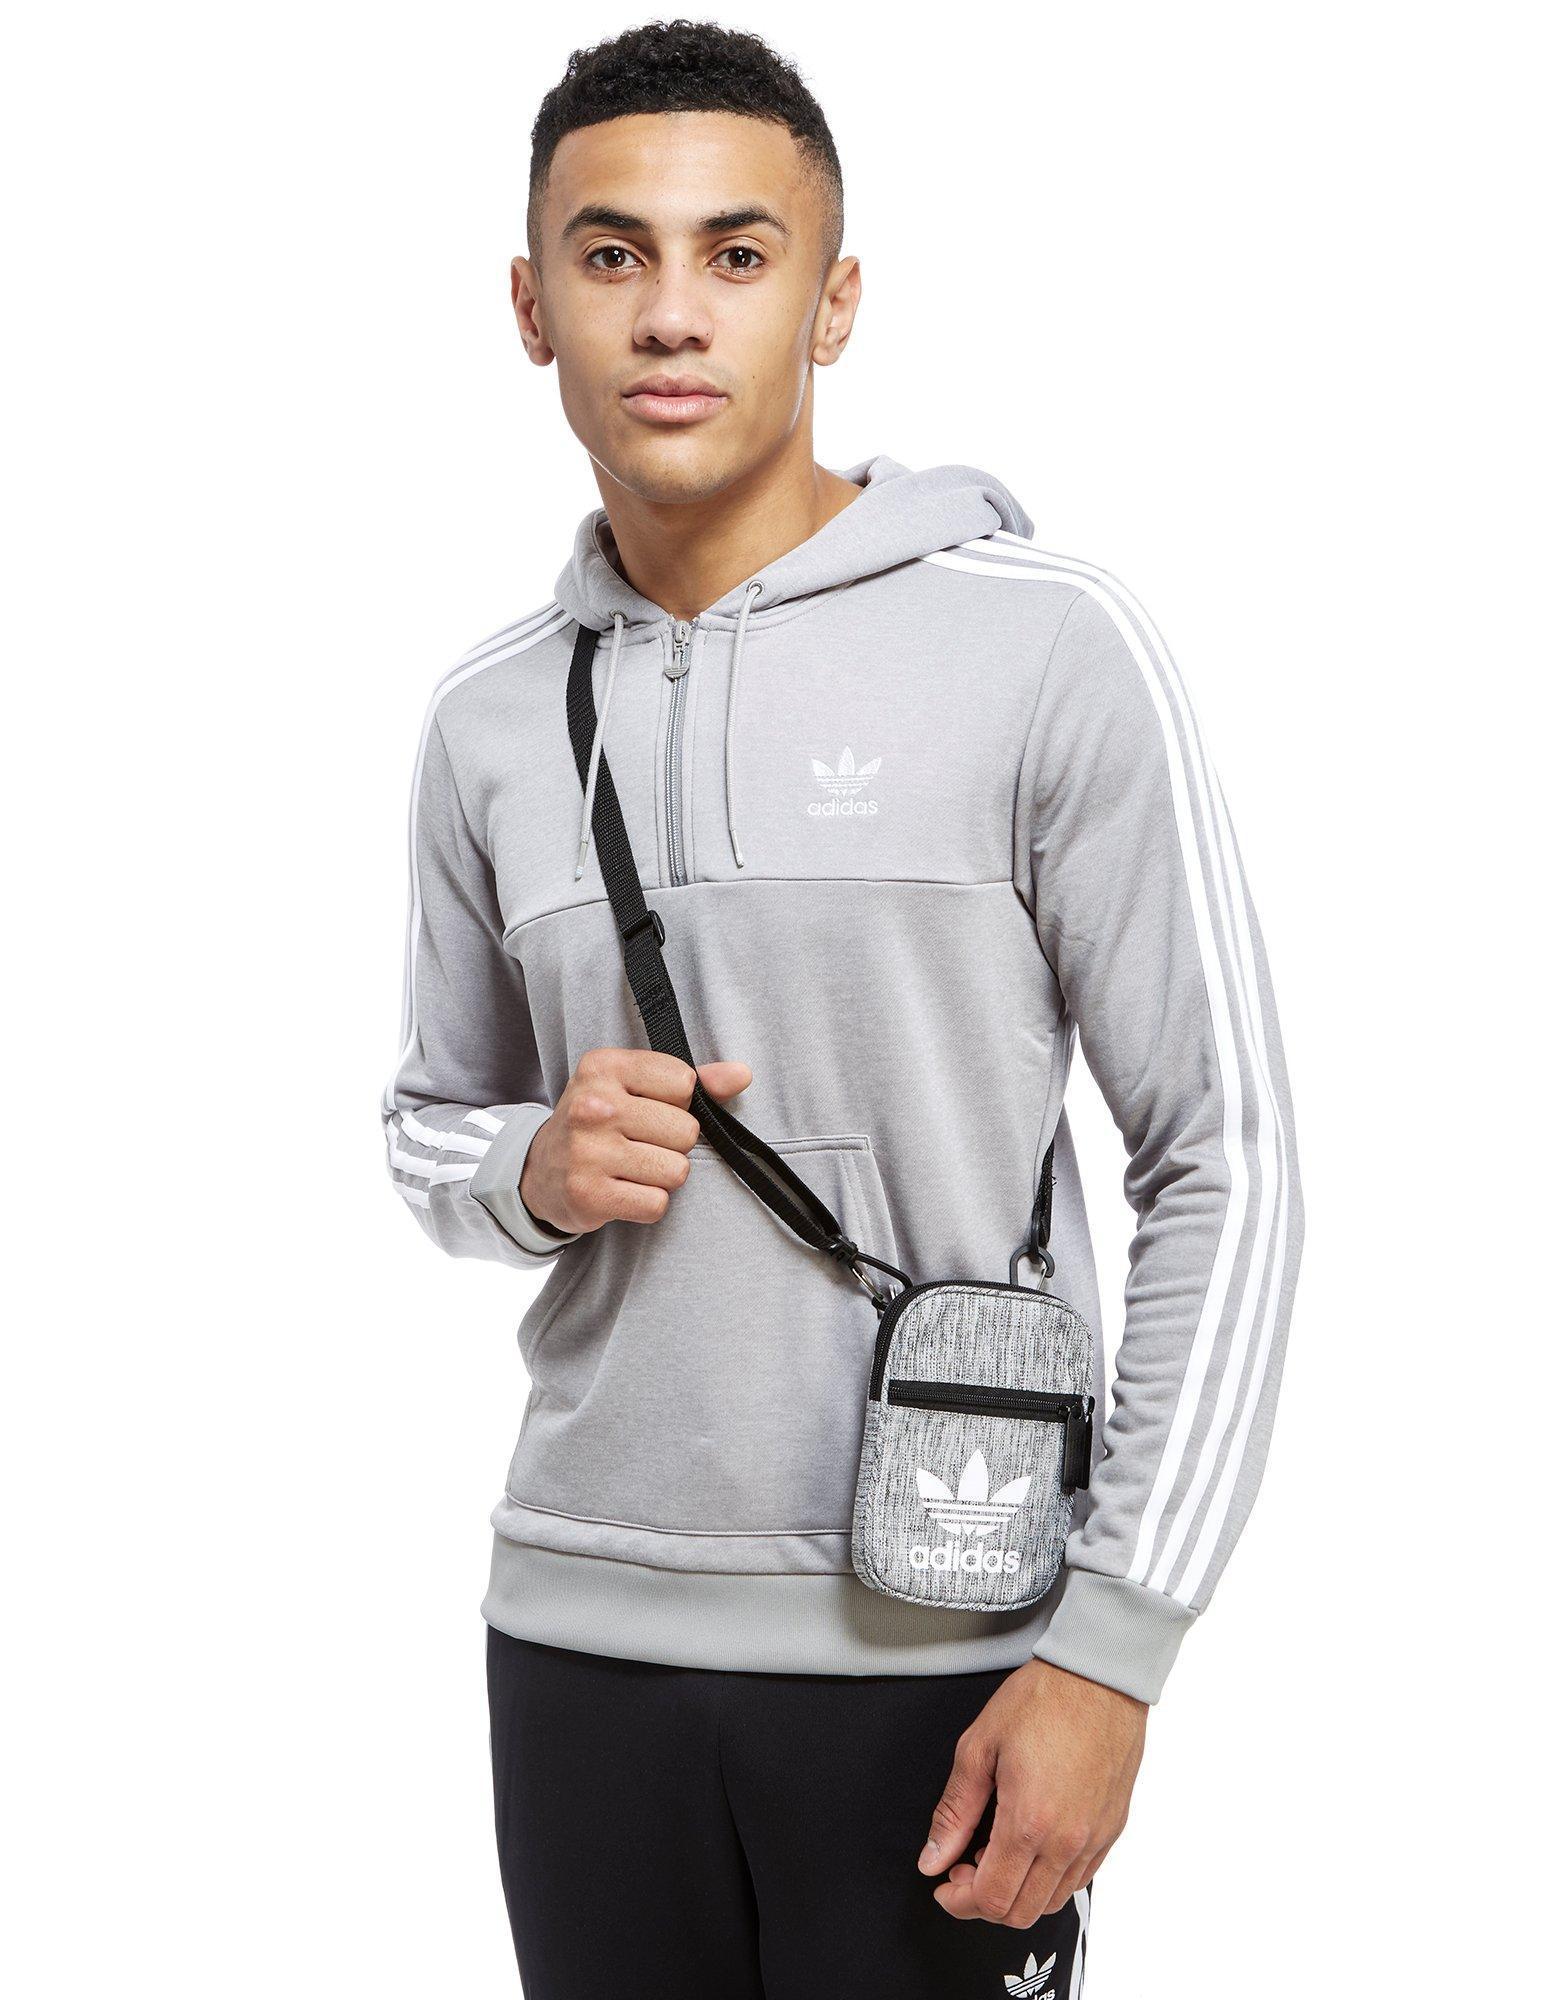 adidas Originals Trefoil Festival Bag in Gray for Men - Lyst d2997aed2d0aa